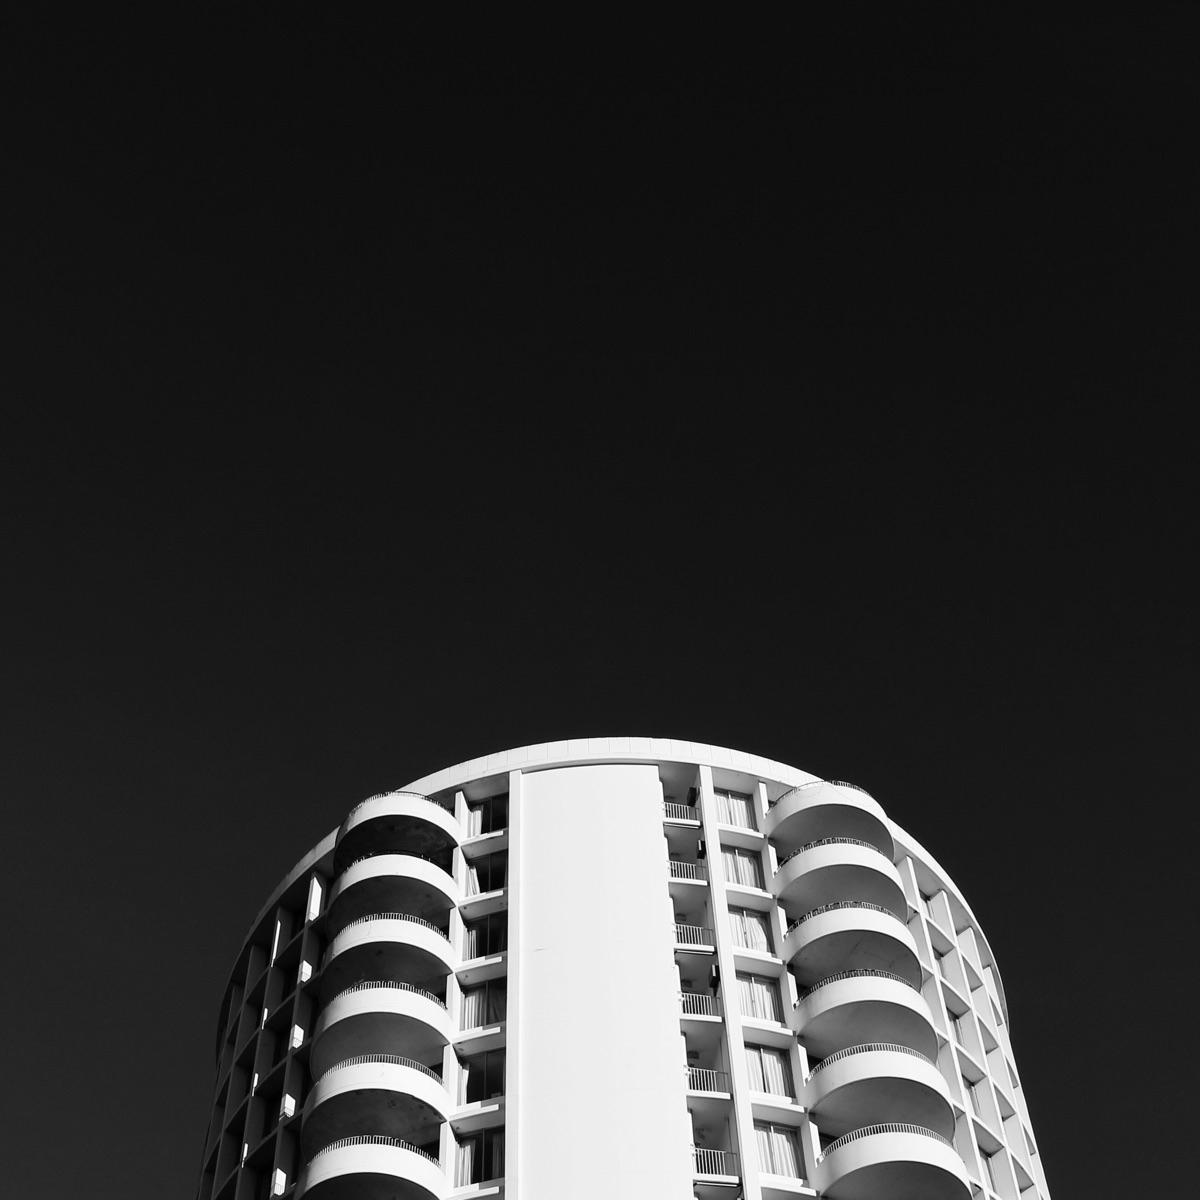 Carillon Tower San Francisco, C - pixnix | ello